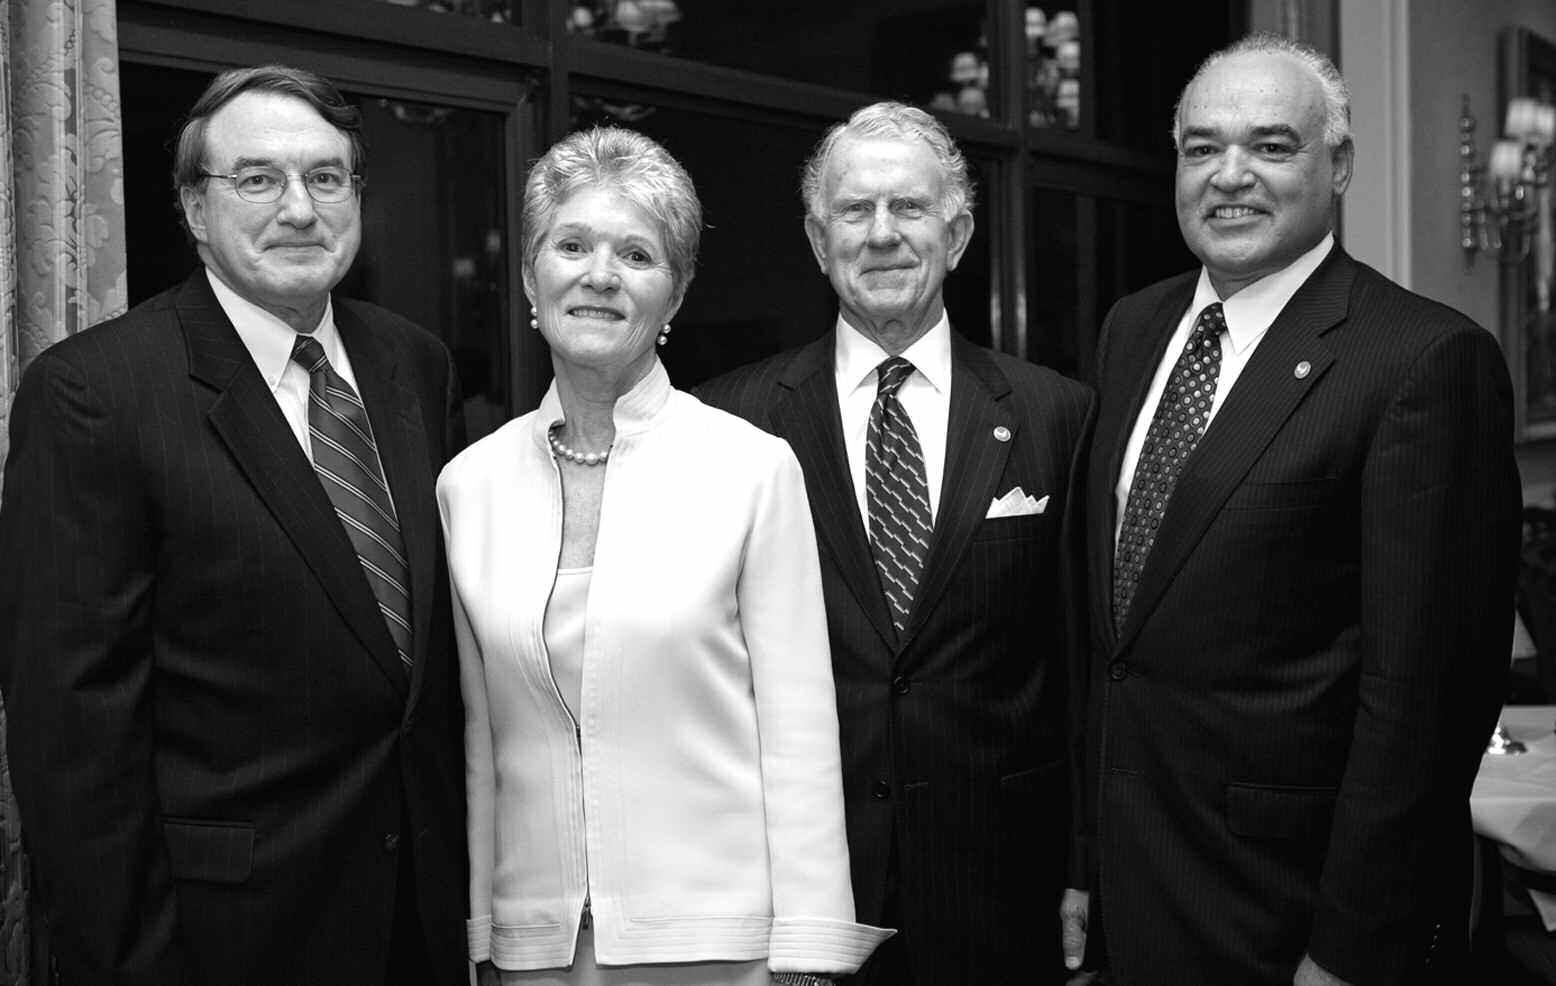 Left to Right: William T. Daniel, Memorial Health Chairman, Board of Directors, Elizabeth Anderson, Curtis Anderson, Phillip Schaengold,Memorial Health President and CEO.